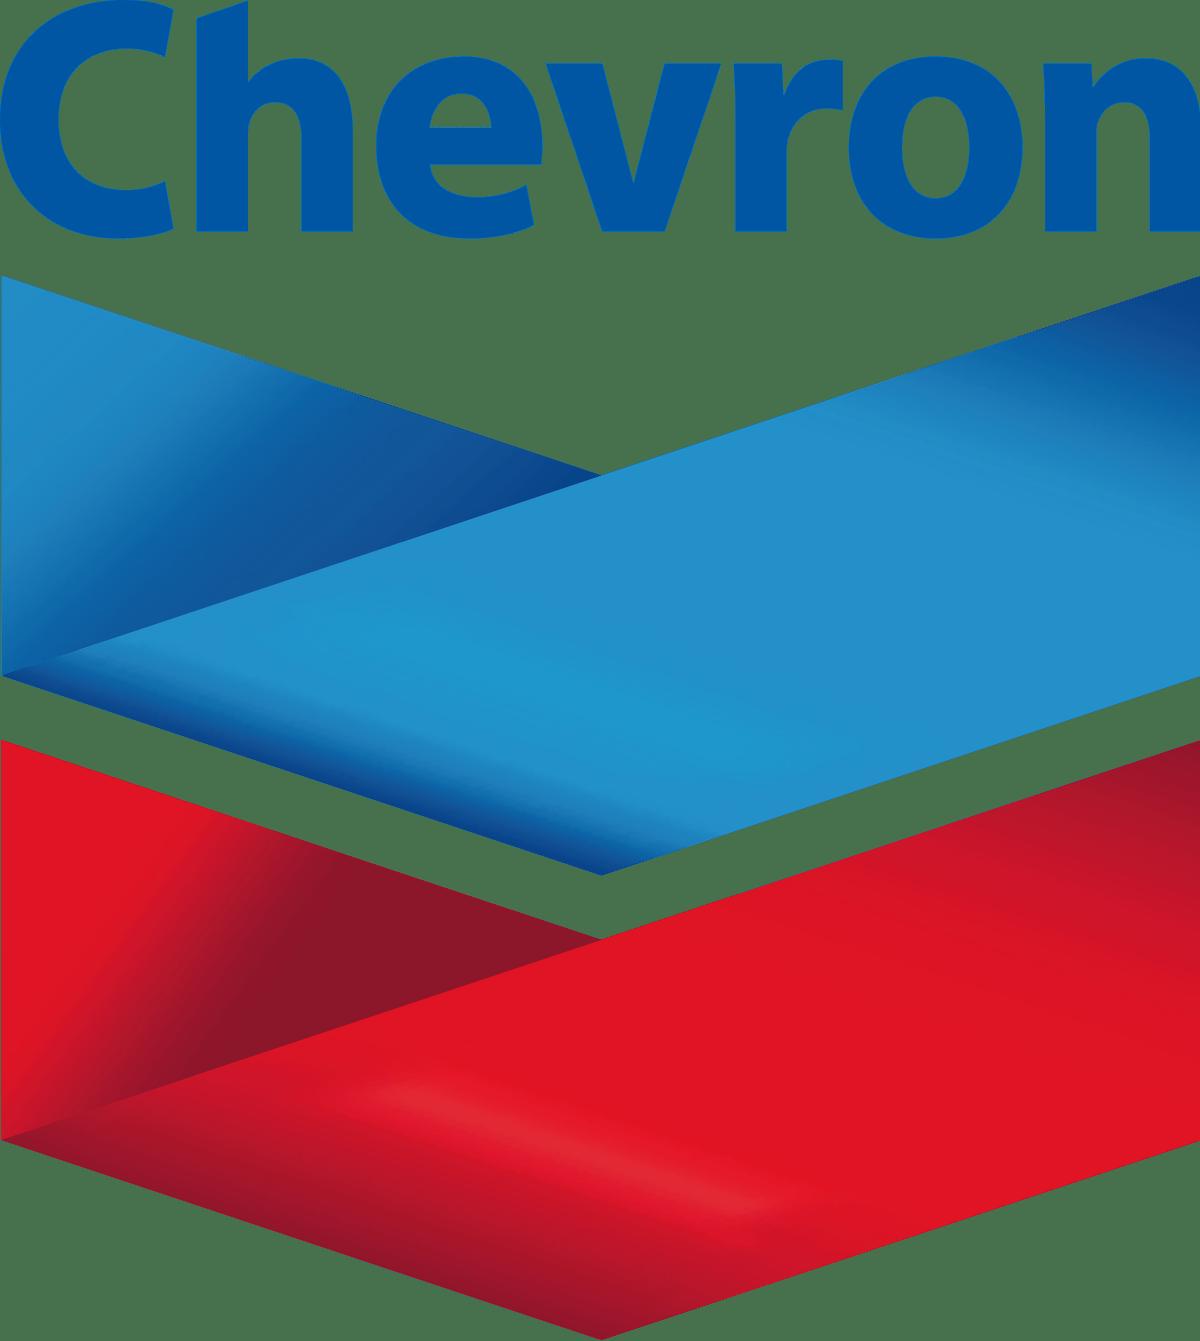 Oil communities in Ondo kick as Chevron shut them out - Vanguard News